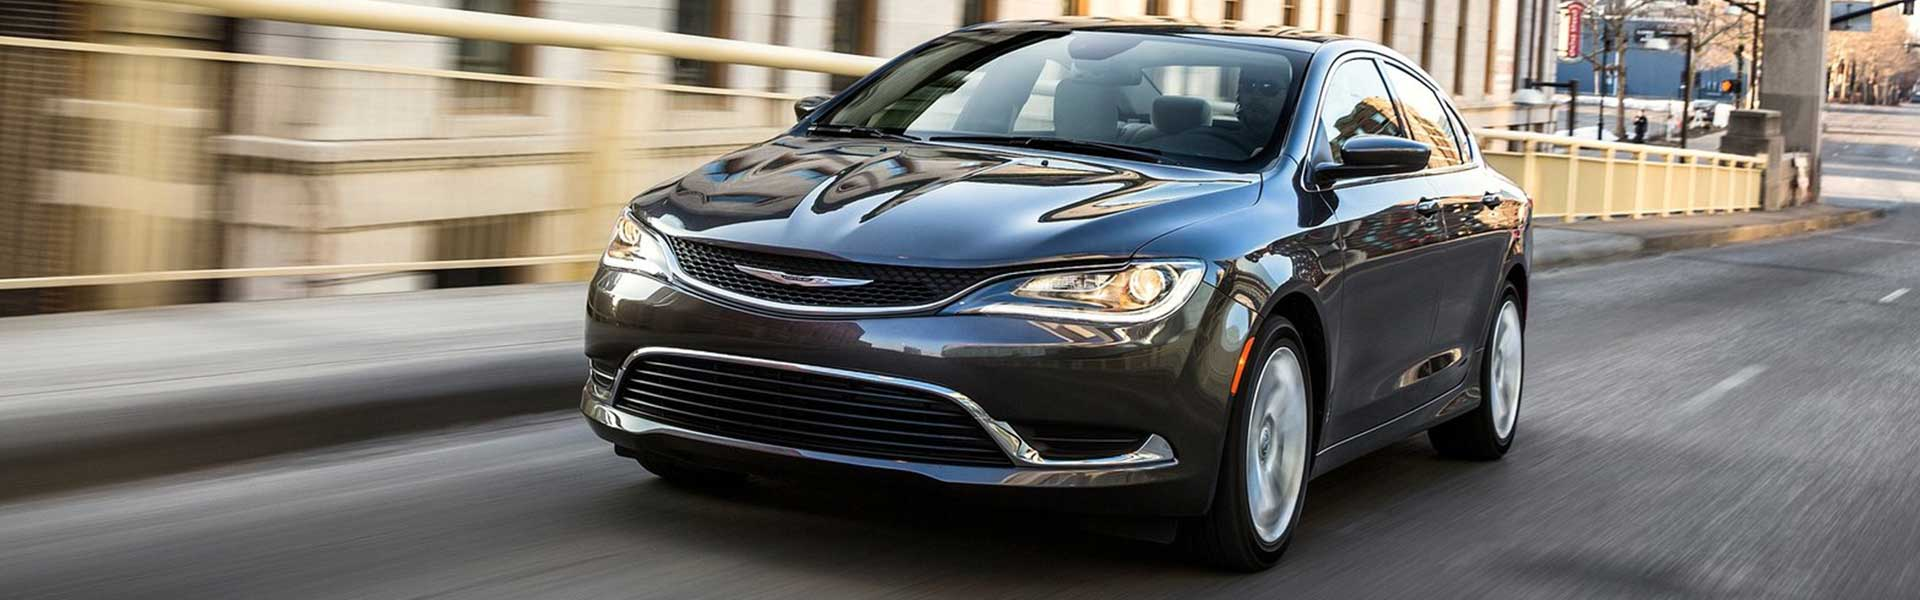 Guaranteed Auto Sales >> J J Auto Sales Car Dealer In Warren Mi